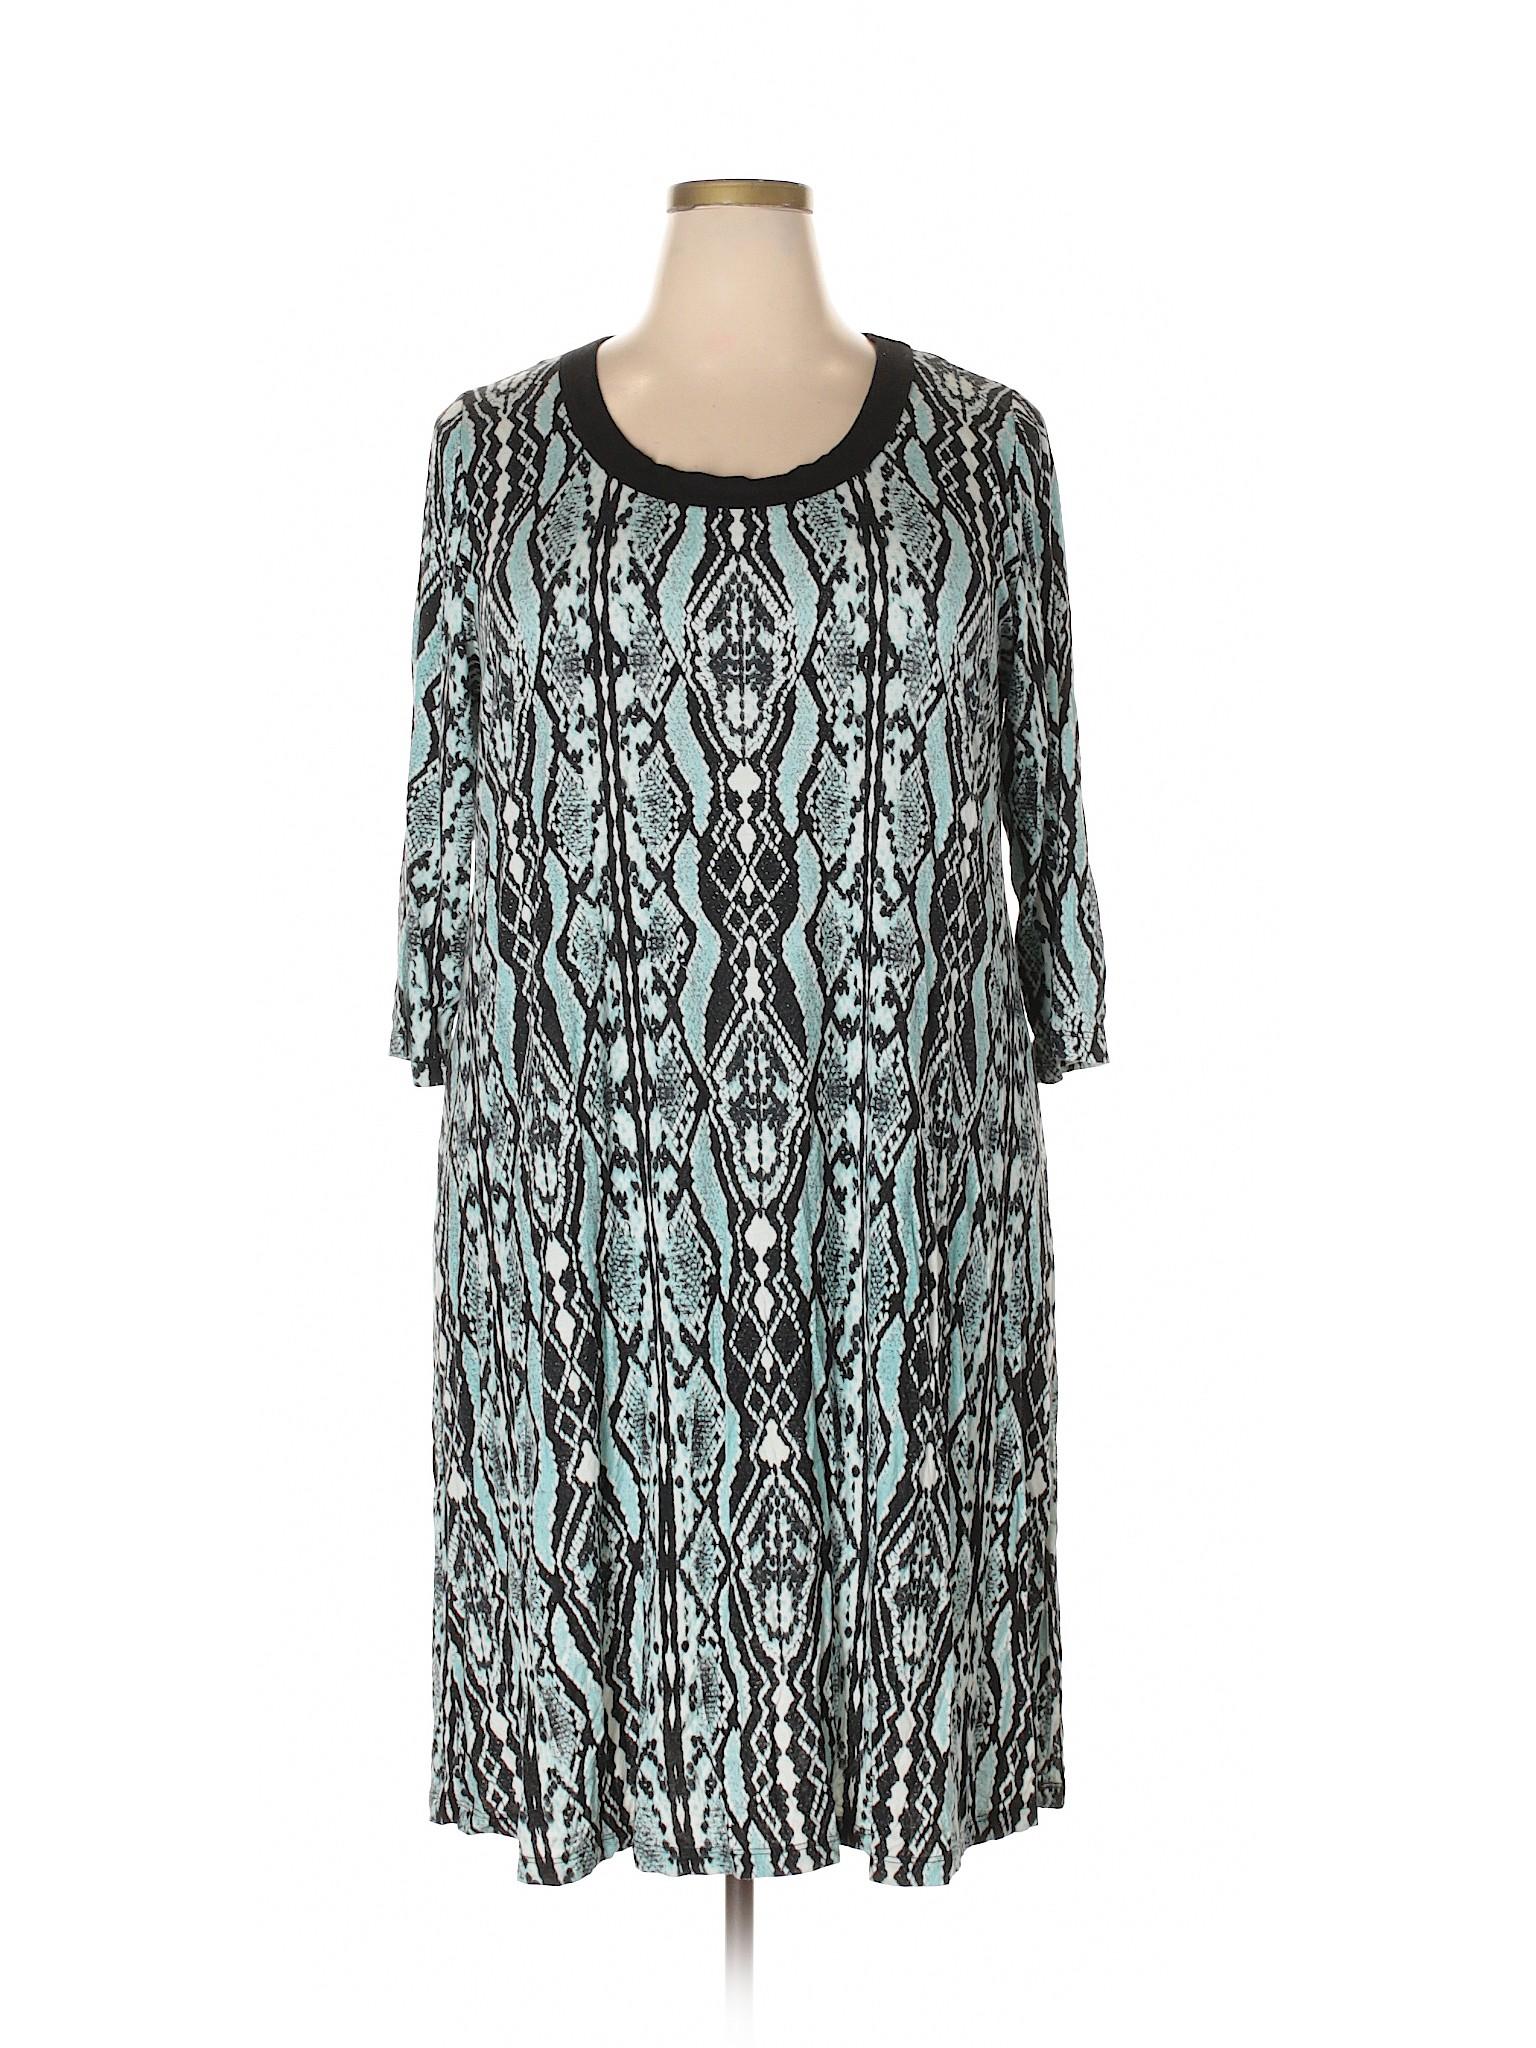 Boutique Casual Kane Dress winter Karen PZqPY7A